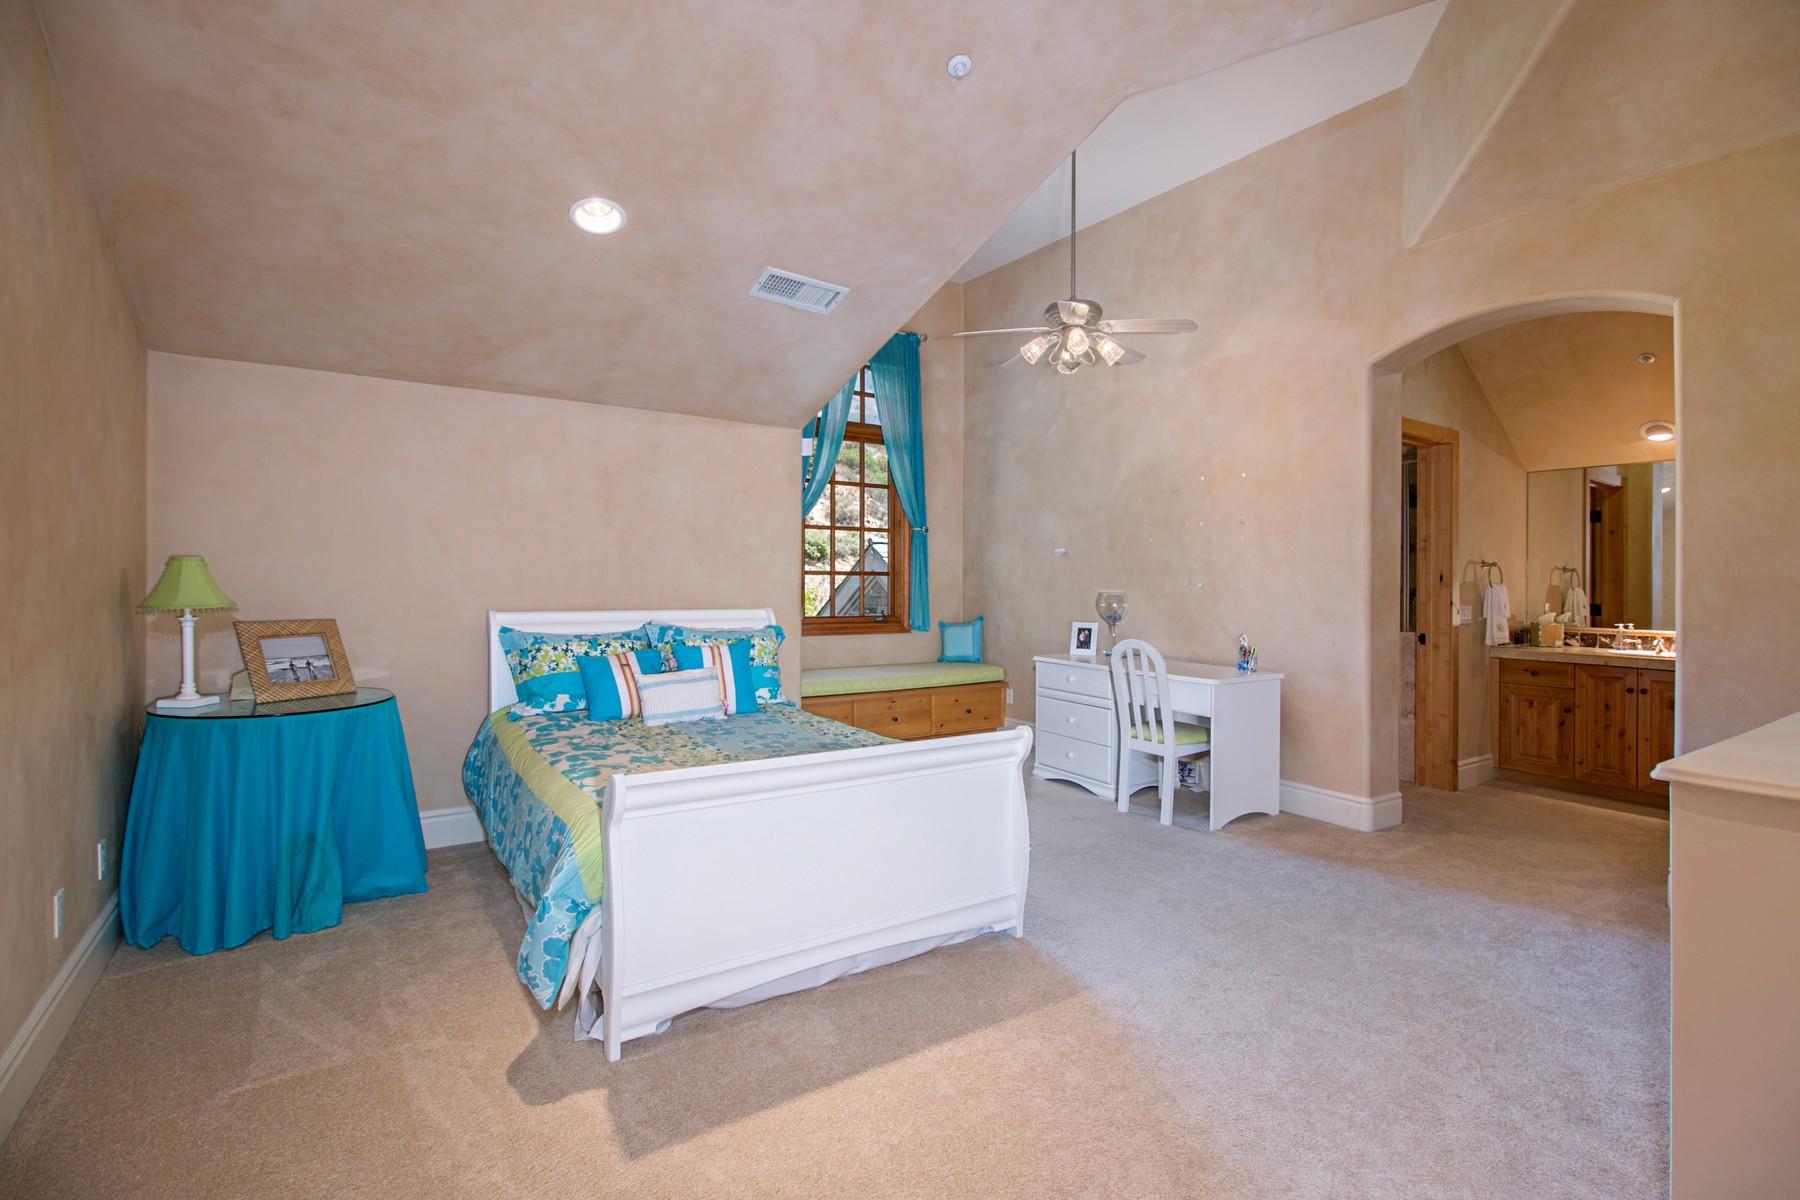 Additional photo for property listing at 14360 Cascade Crossing  Poway, Калифорния 92064 Соединенные Штаты